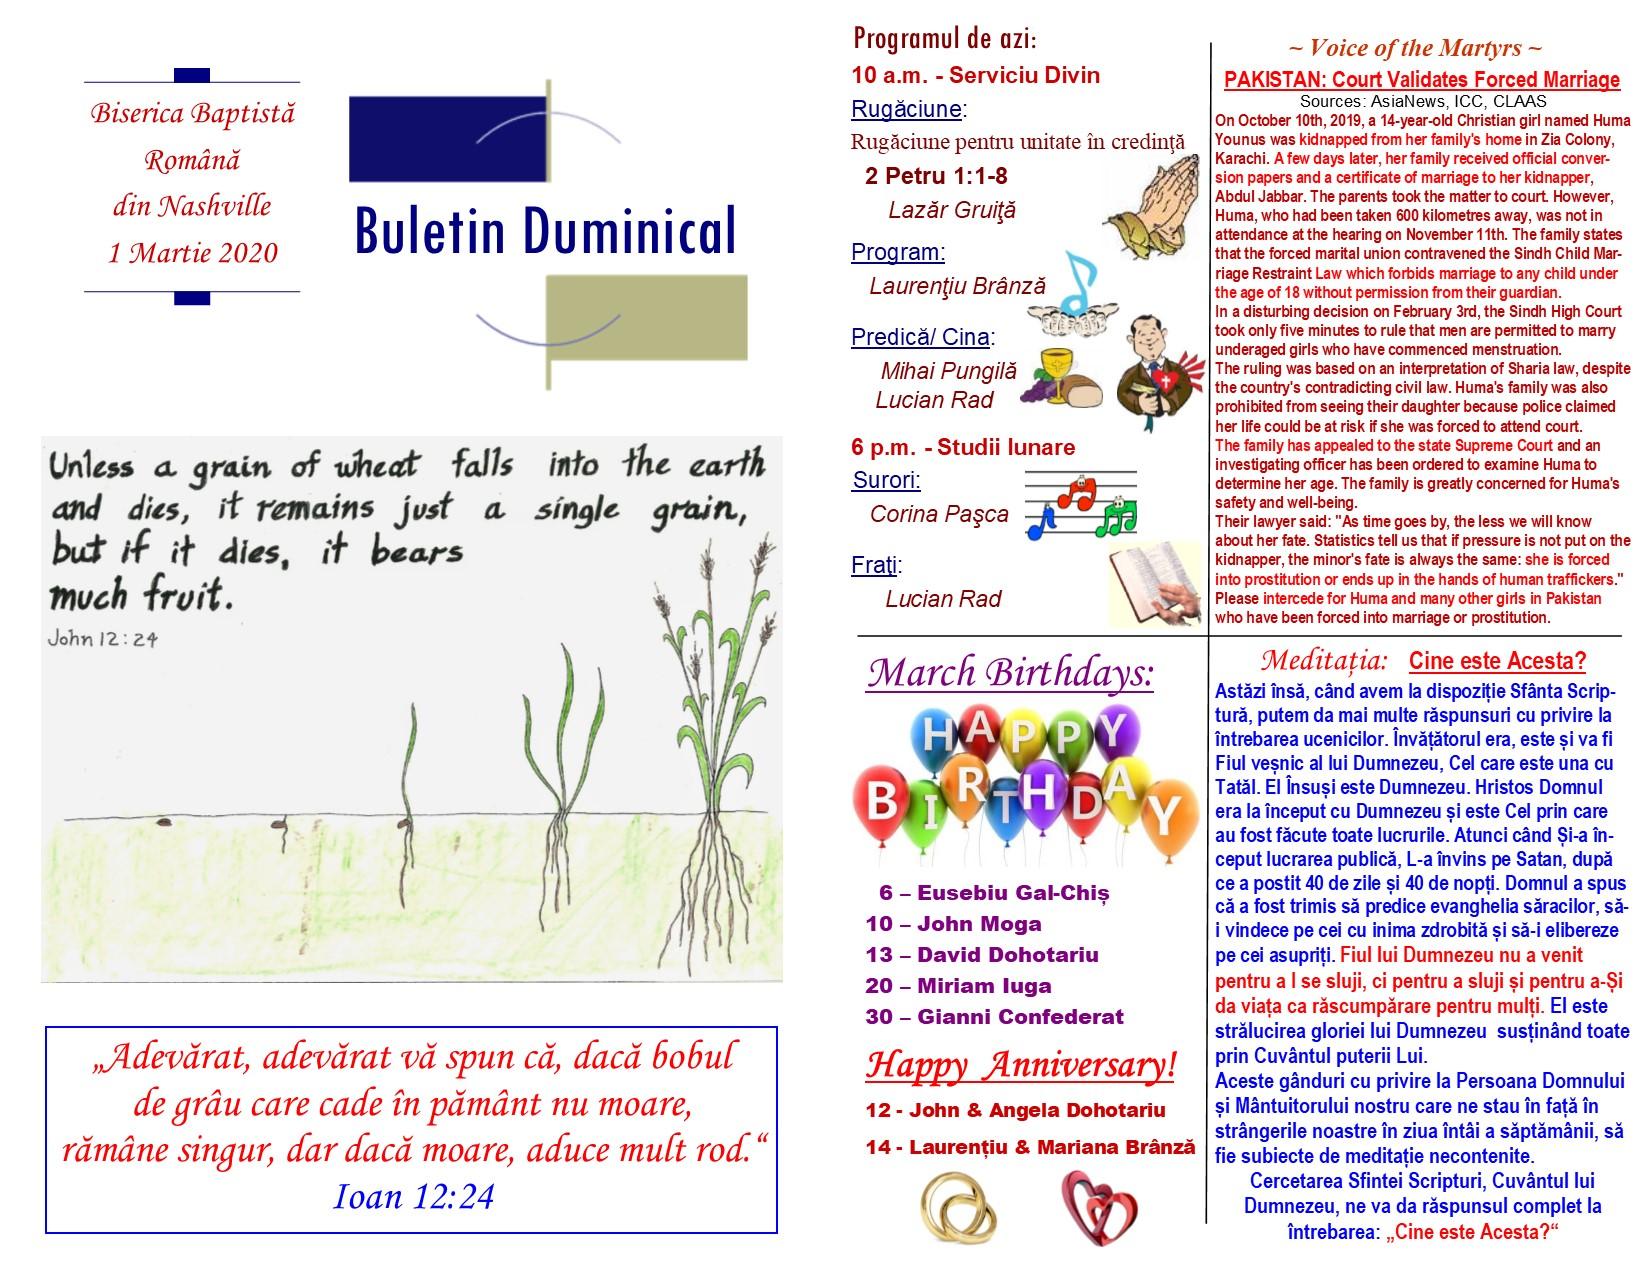 Buletin 03-01-20 page 1 & 2